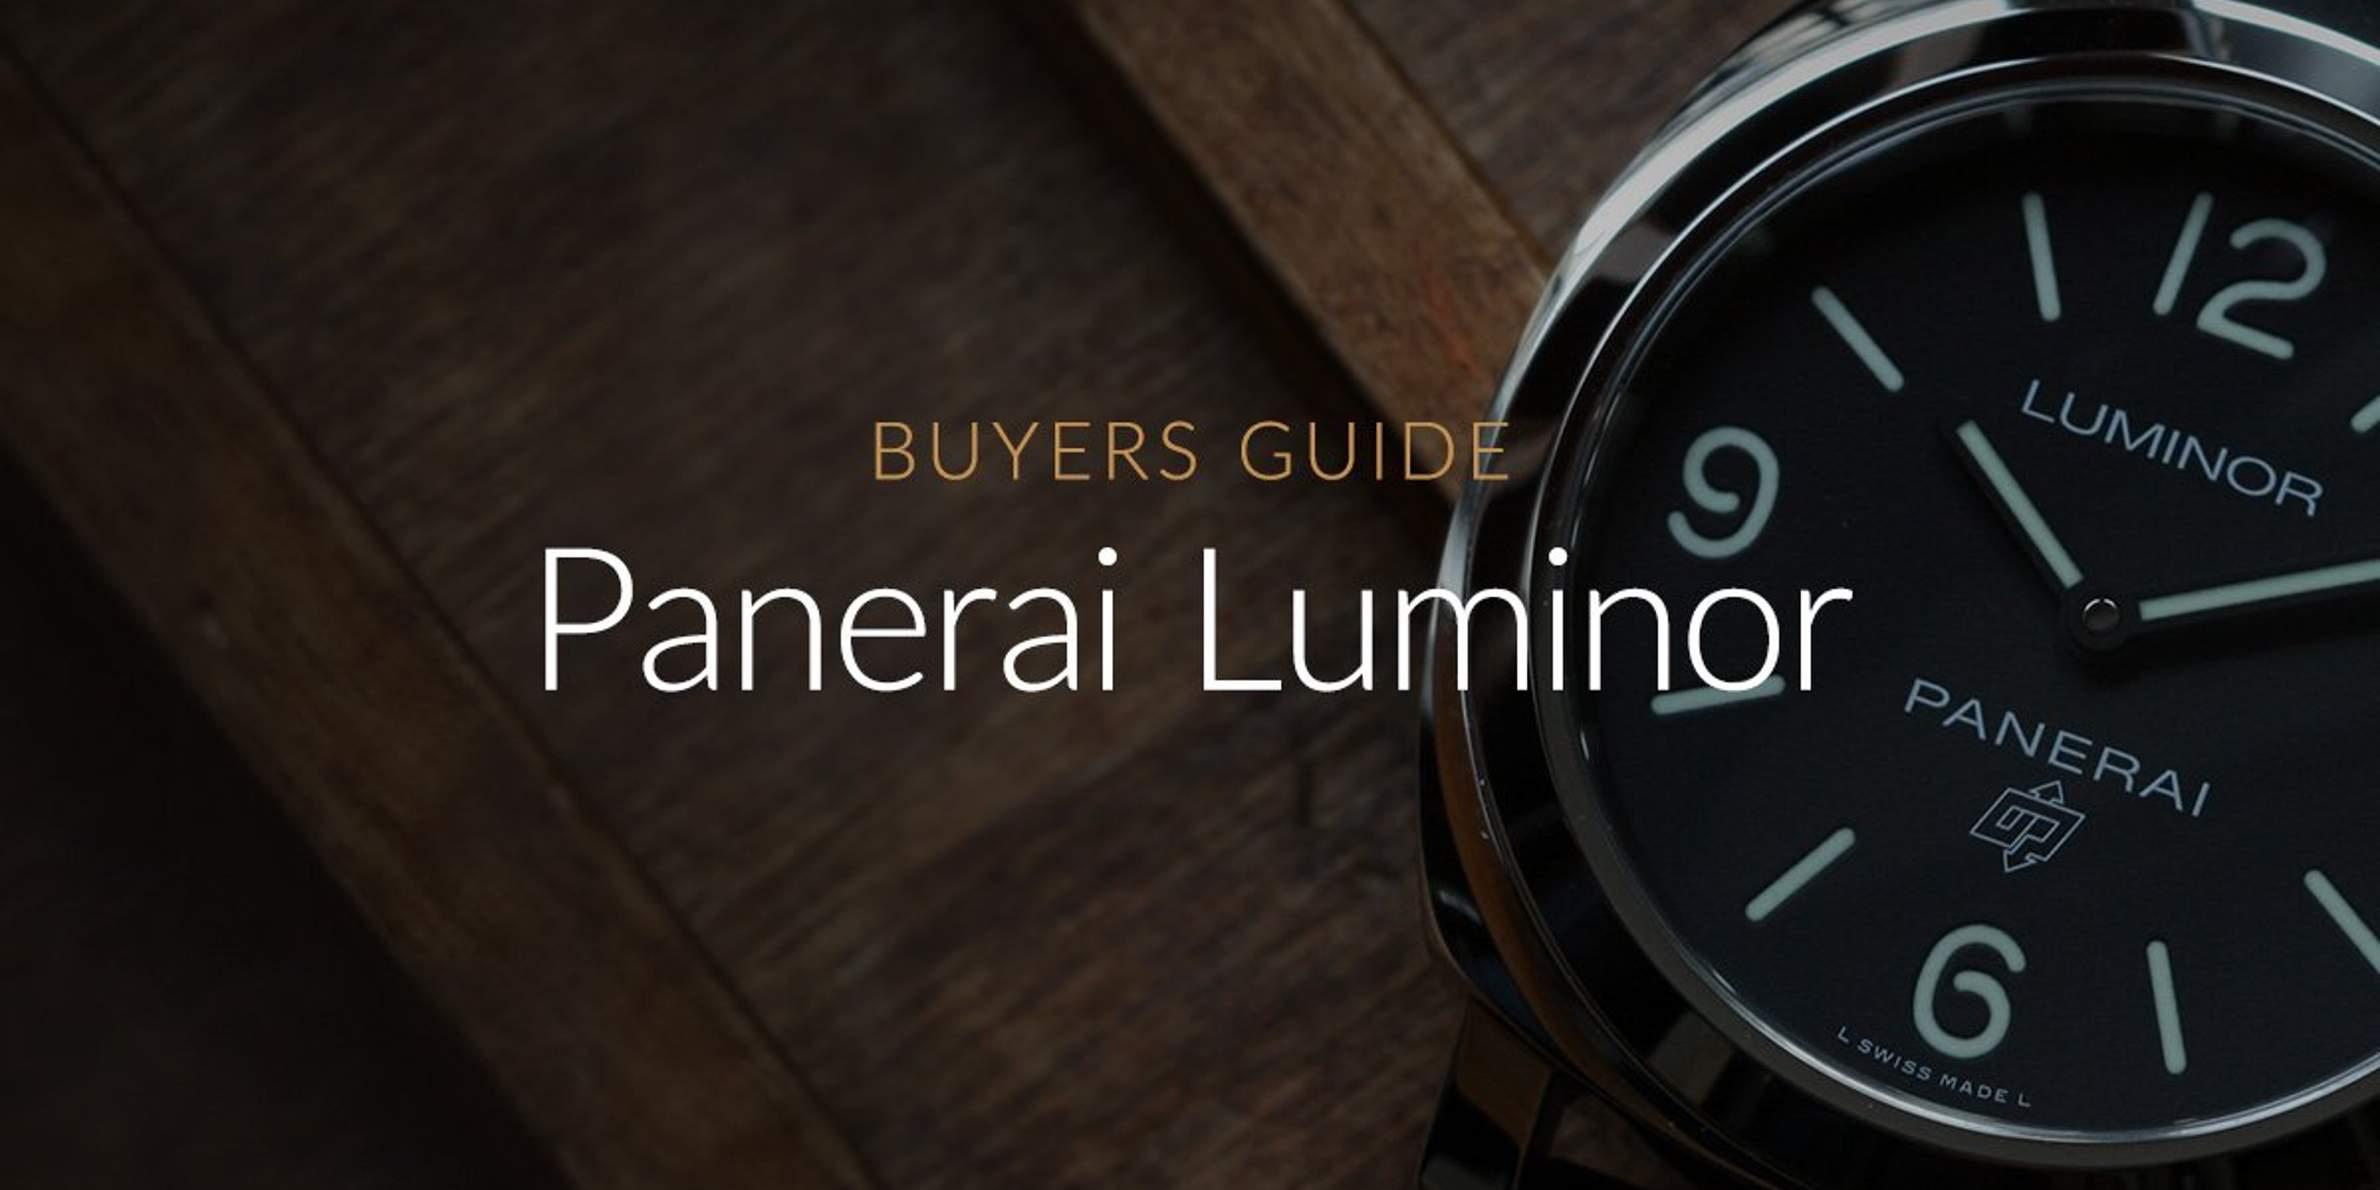 CAM-1081-Buyers-Guide-Panerai-1-1-EN